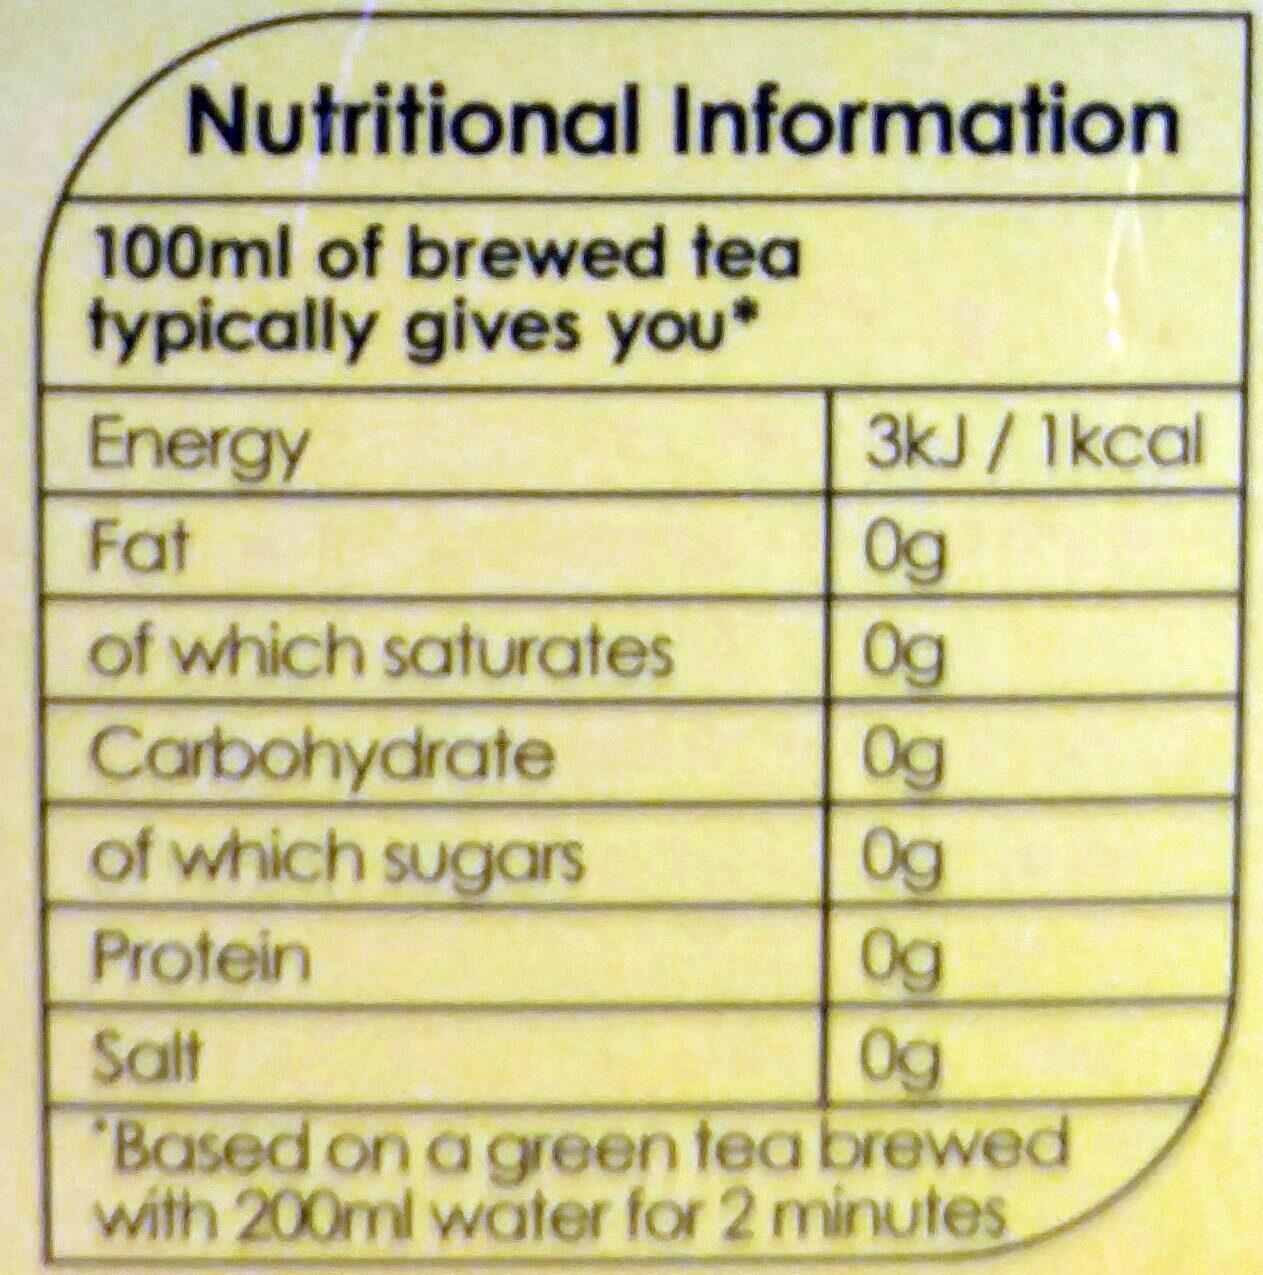 Twinings apple & pear green tea - Nutrition facts